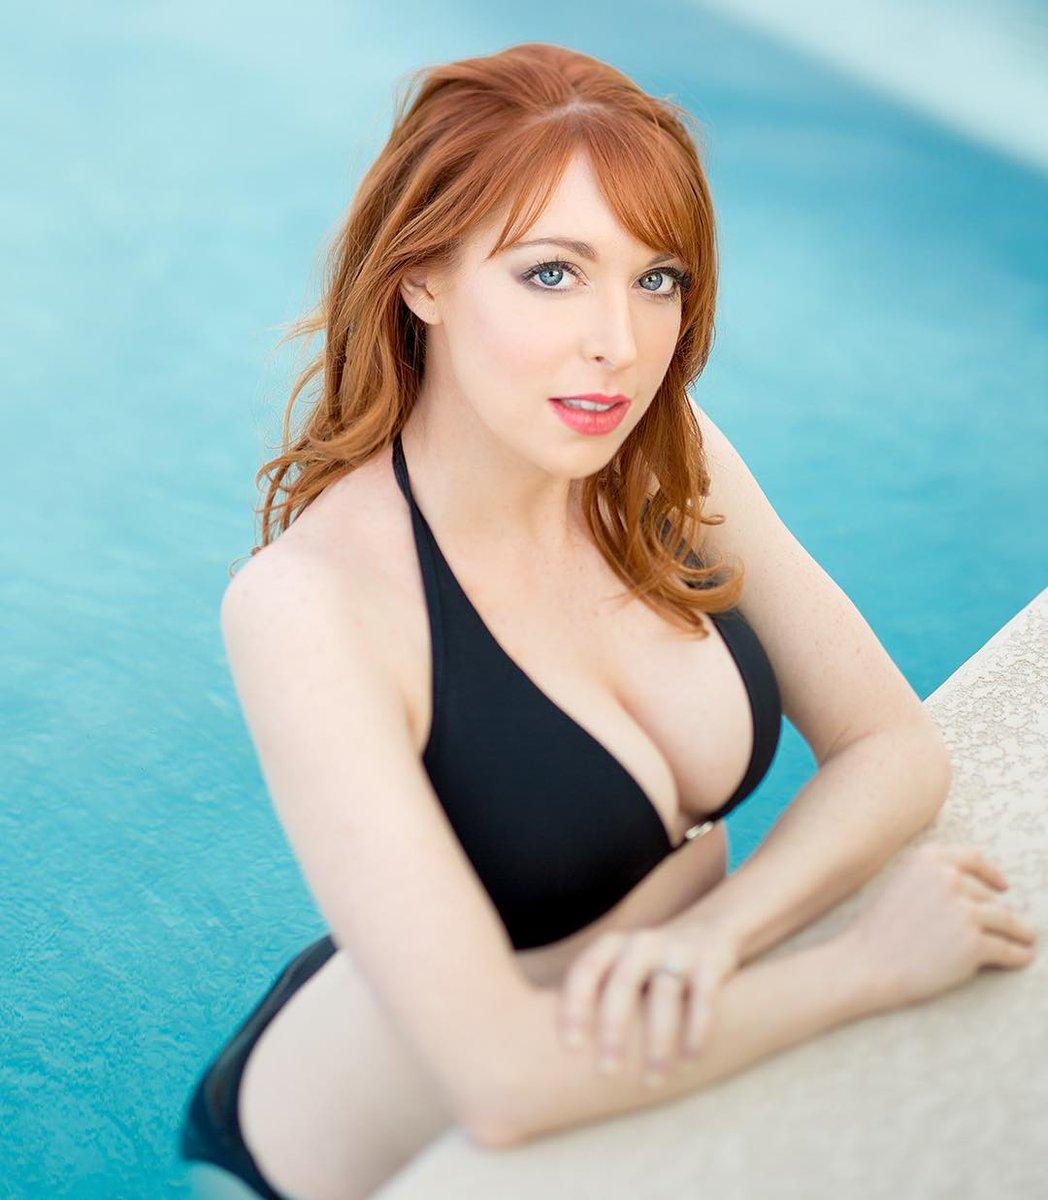 Lisa Foiles nudes (11 foto and video), Pussy, Sideboobs, Instagram, underwear 2006